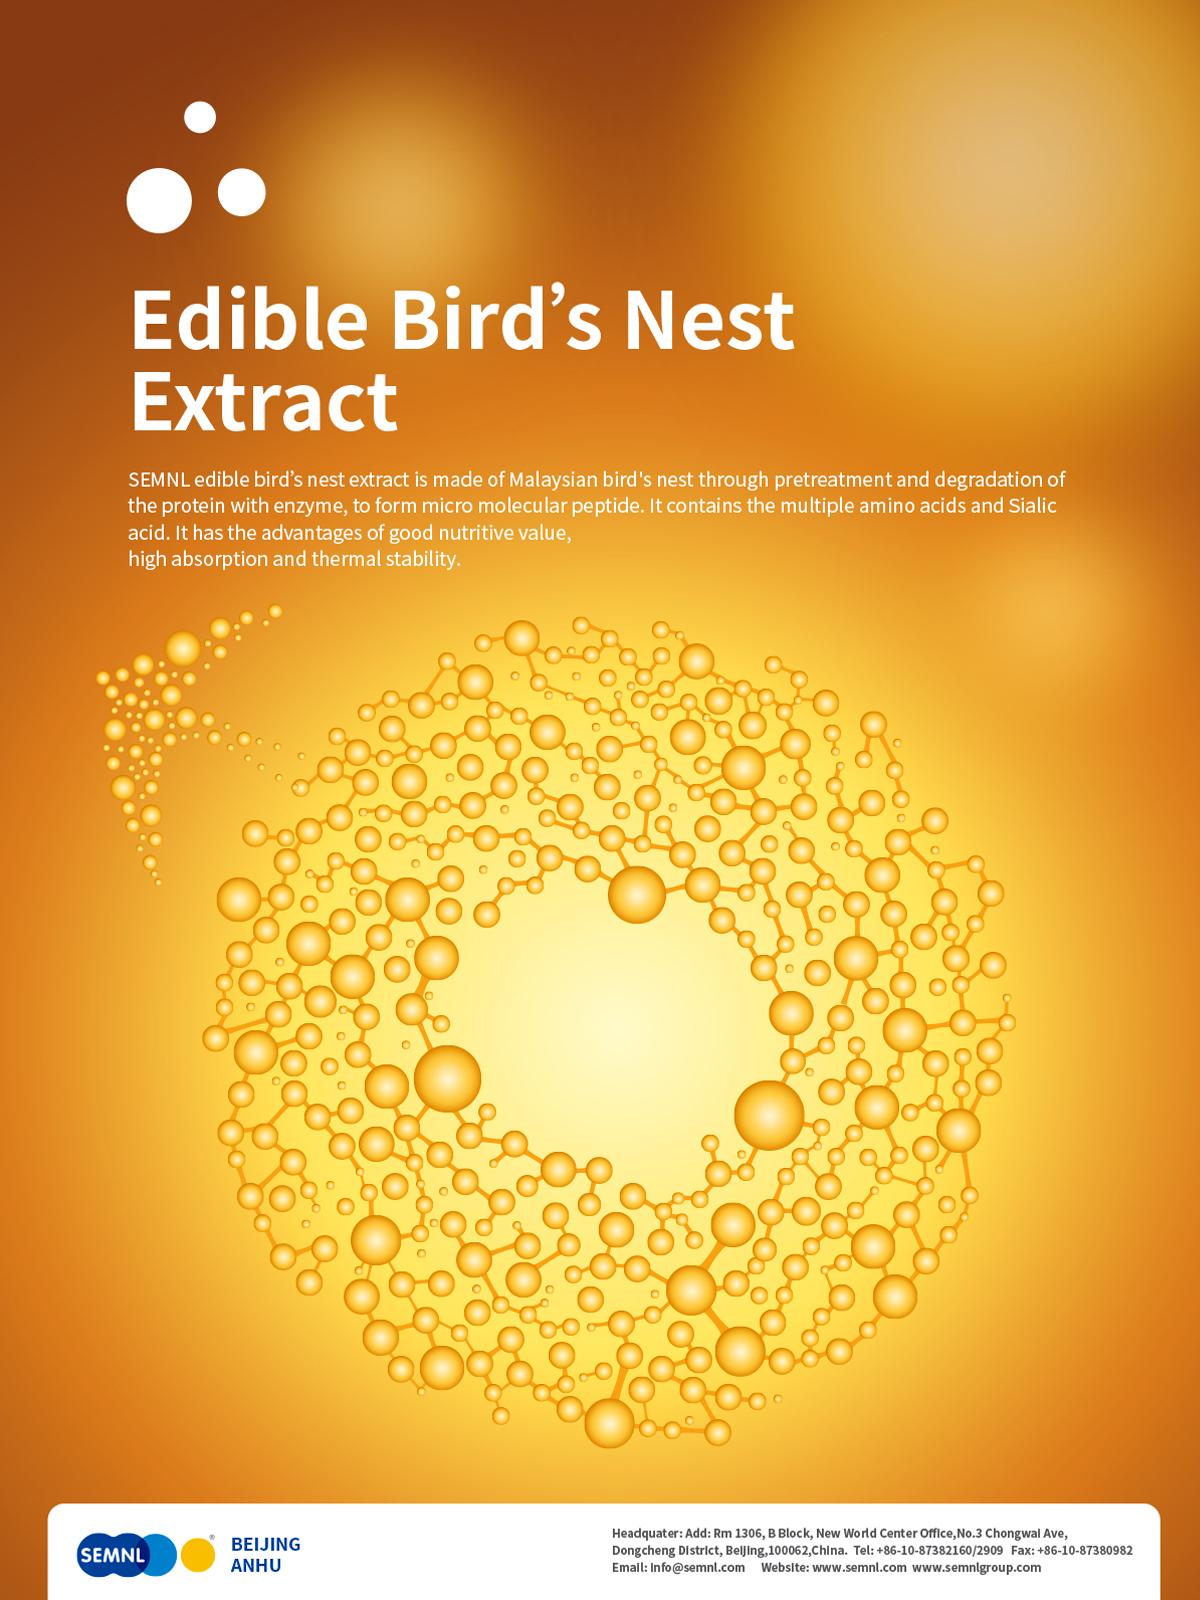 Edible Bird' s Nest Extract